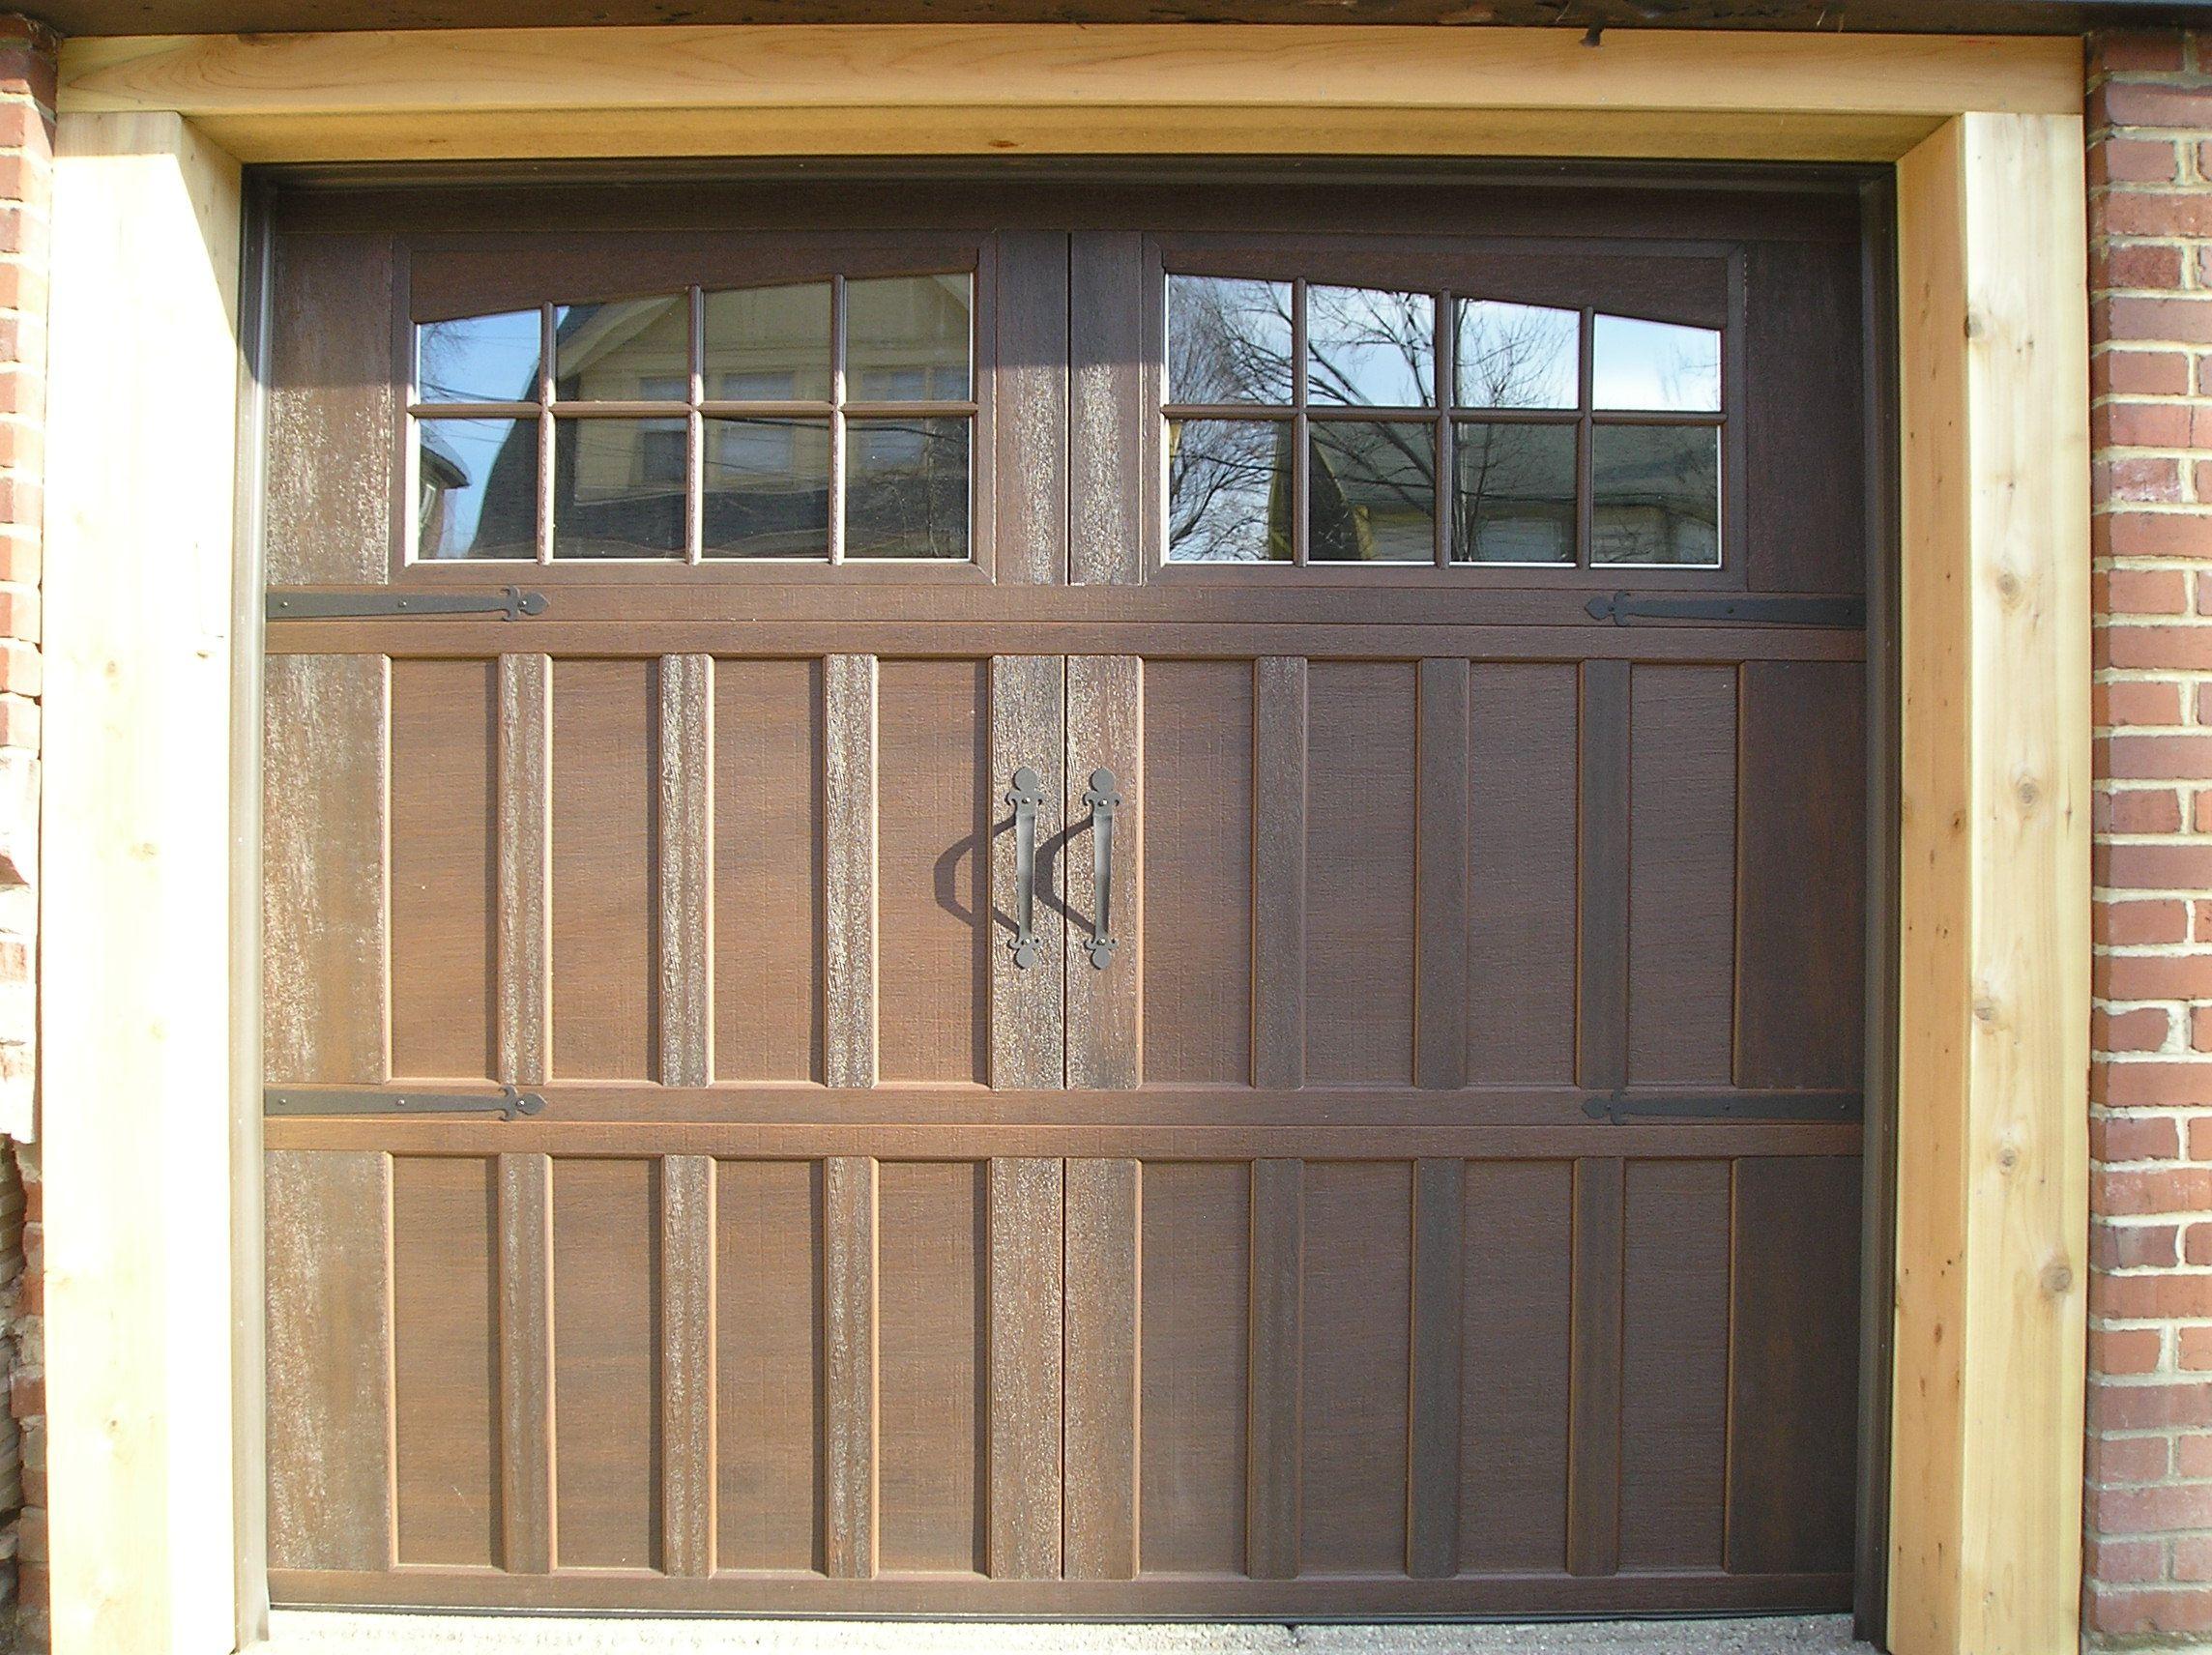 dalton brand ny doors arthur long garage babylon west sons island in f wayne door